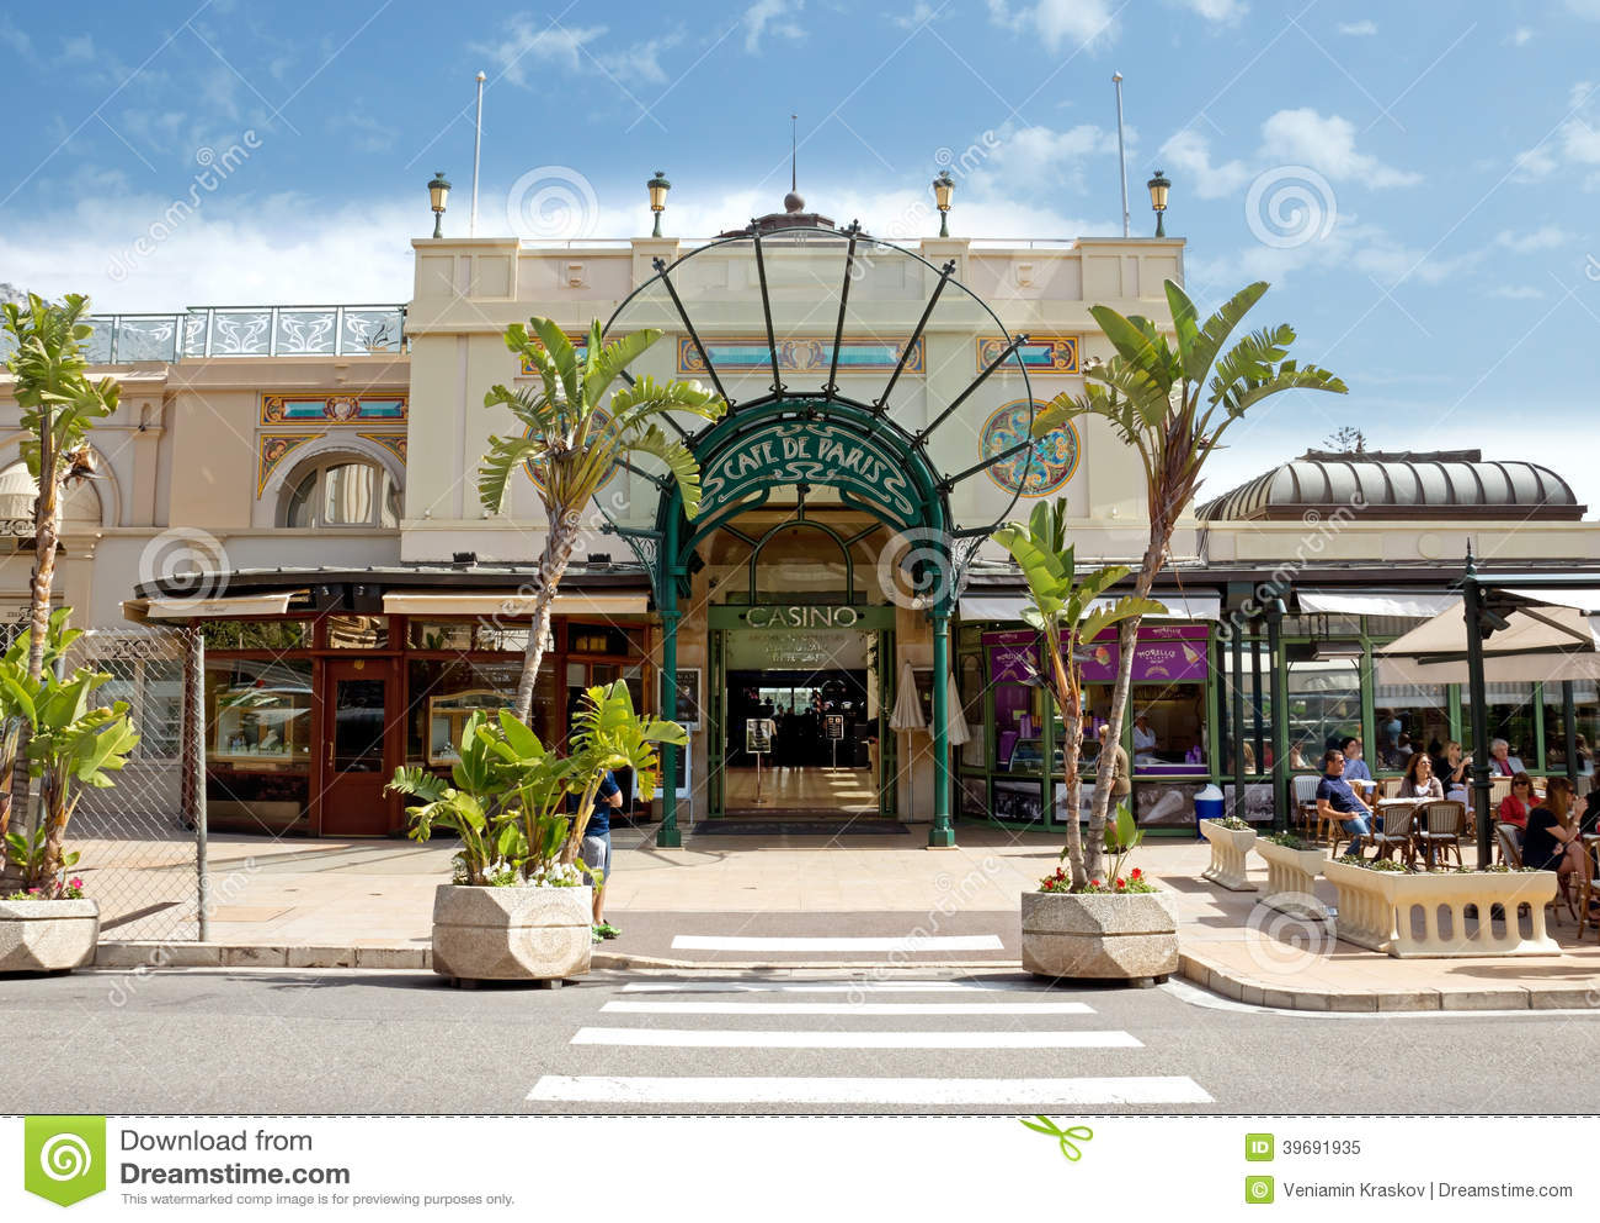 Cafe De Paris Restaurant Monte Carlo